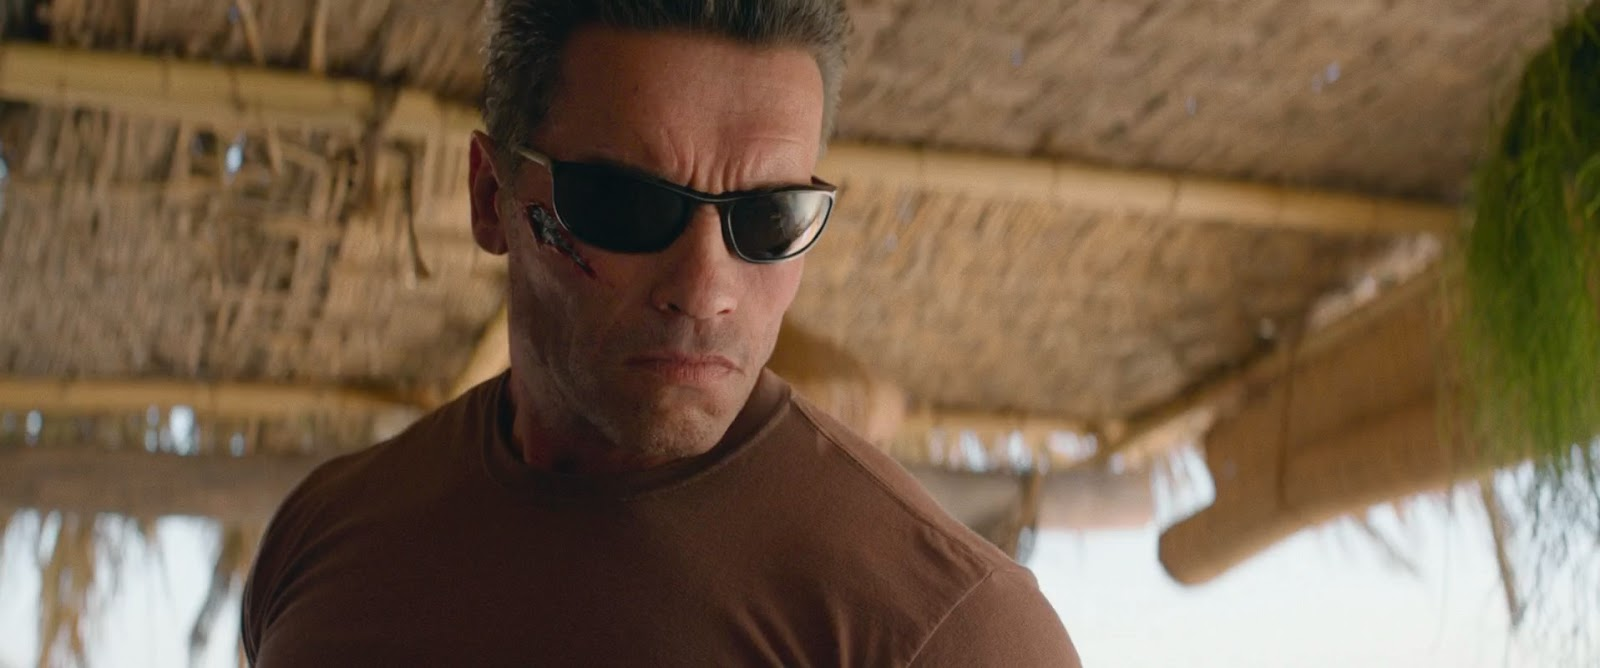 Terminator+Destino+oculto+%282019%29+HD+1080p+WEB-DL+Latino+-+Ingles+-+Descargatepelis.com.mkv_snapshot_00.03.47_%5B2020.01.14_01.10.27%5D.jpg (1600×668)